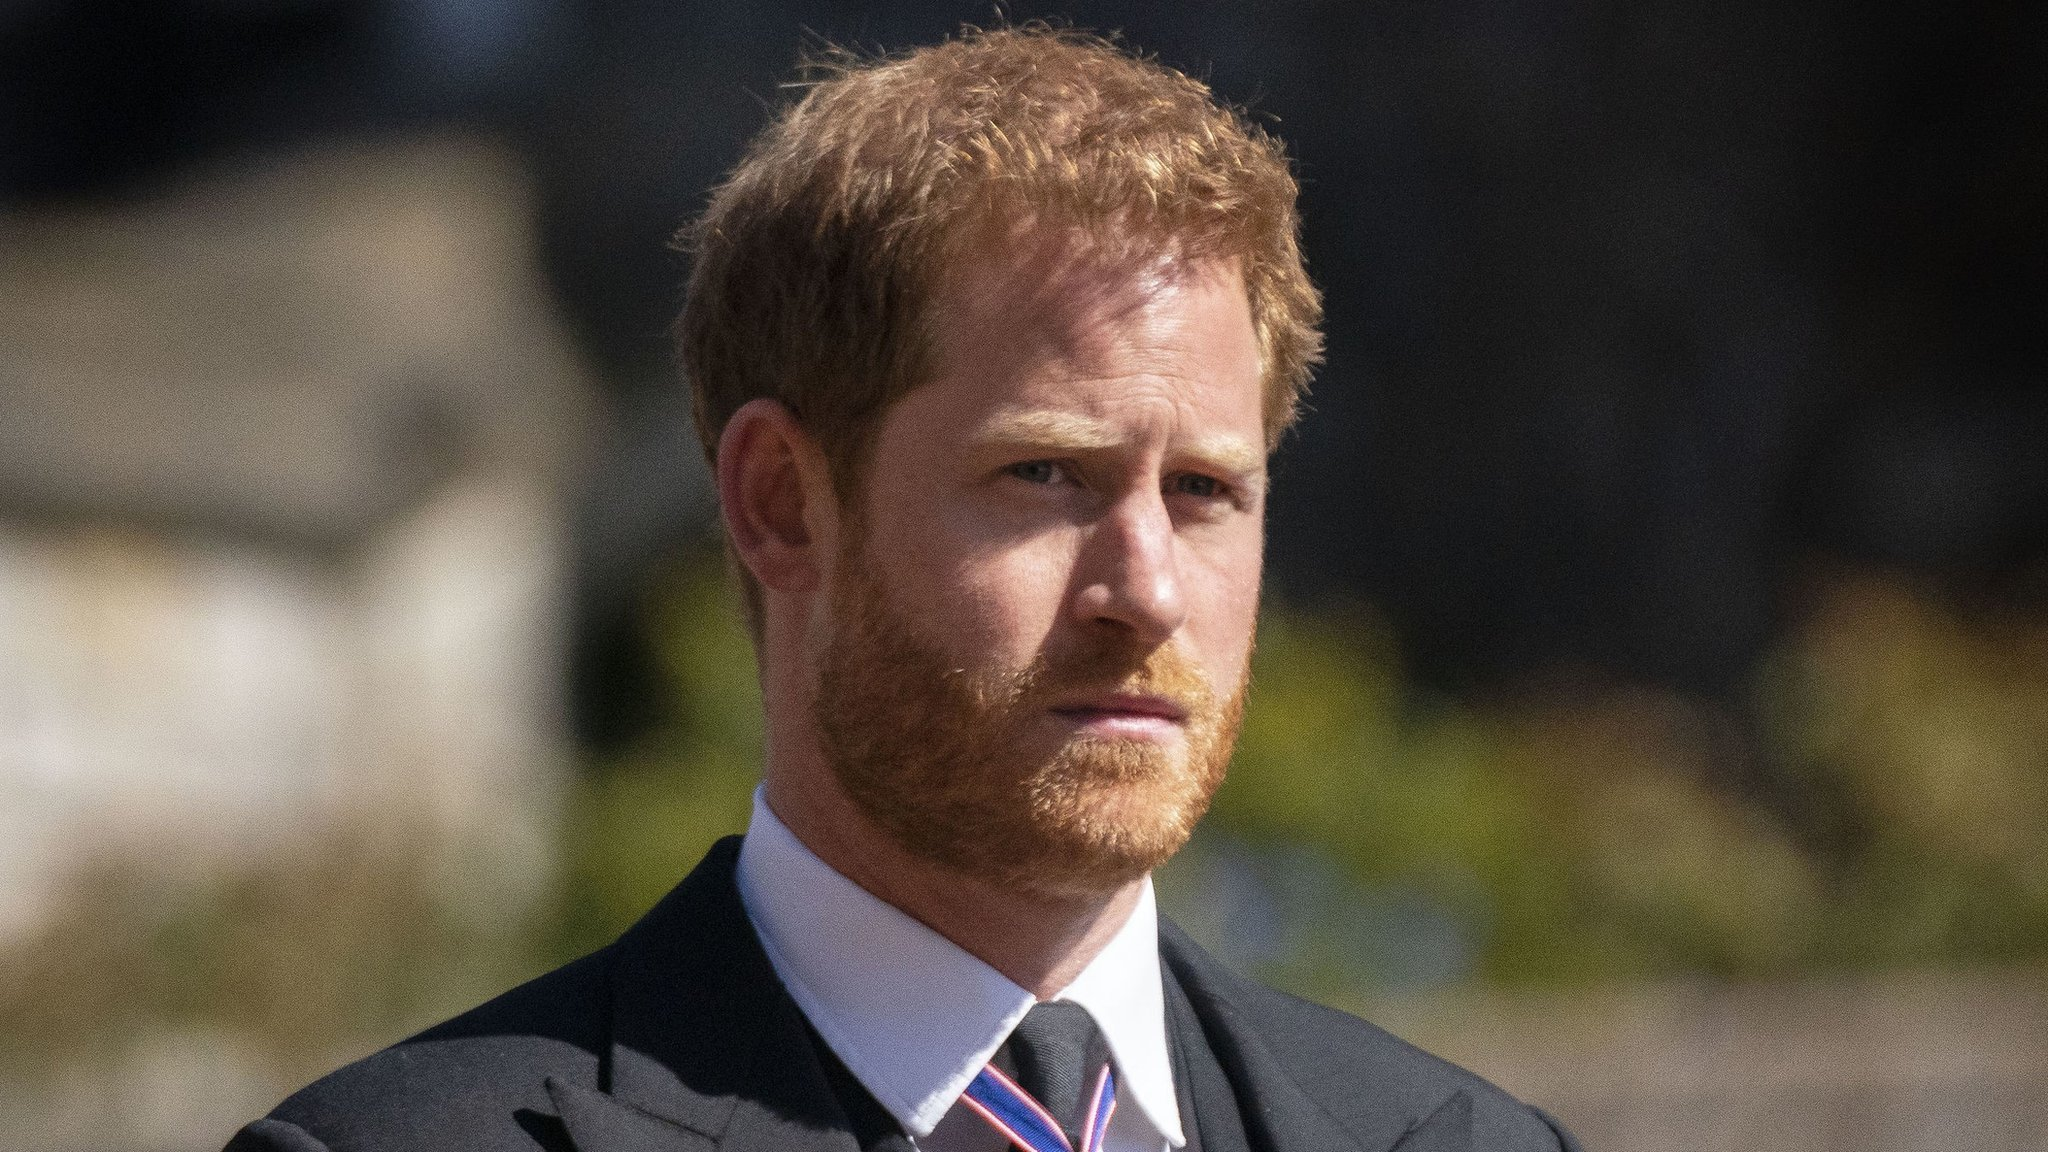 Prince Harry in April 2021